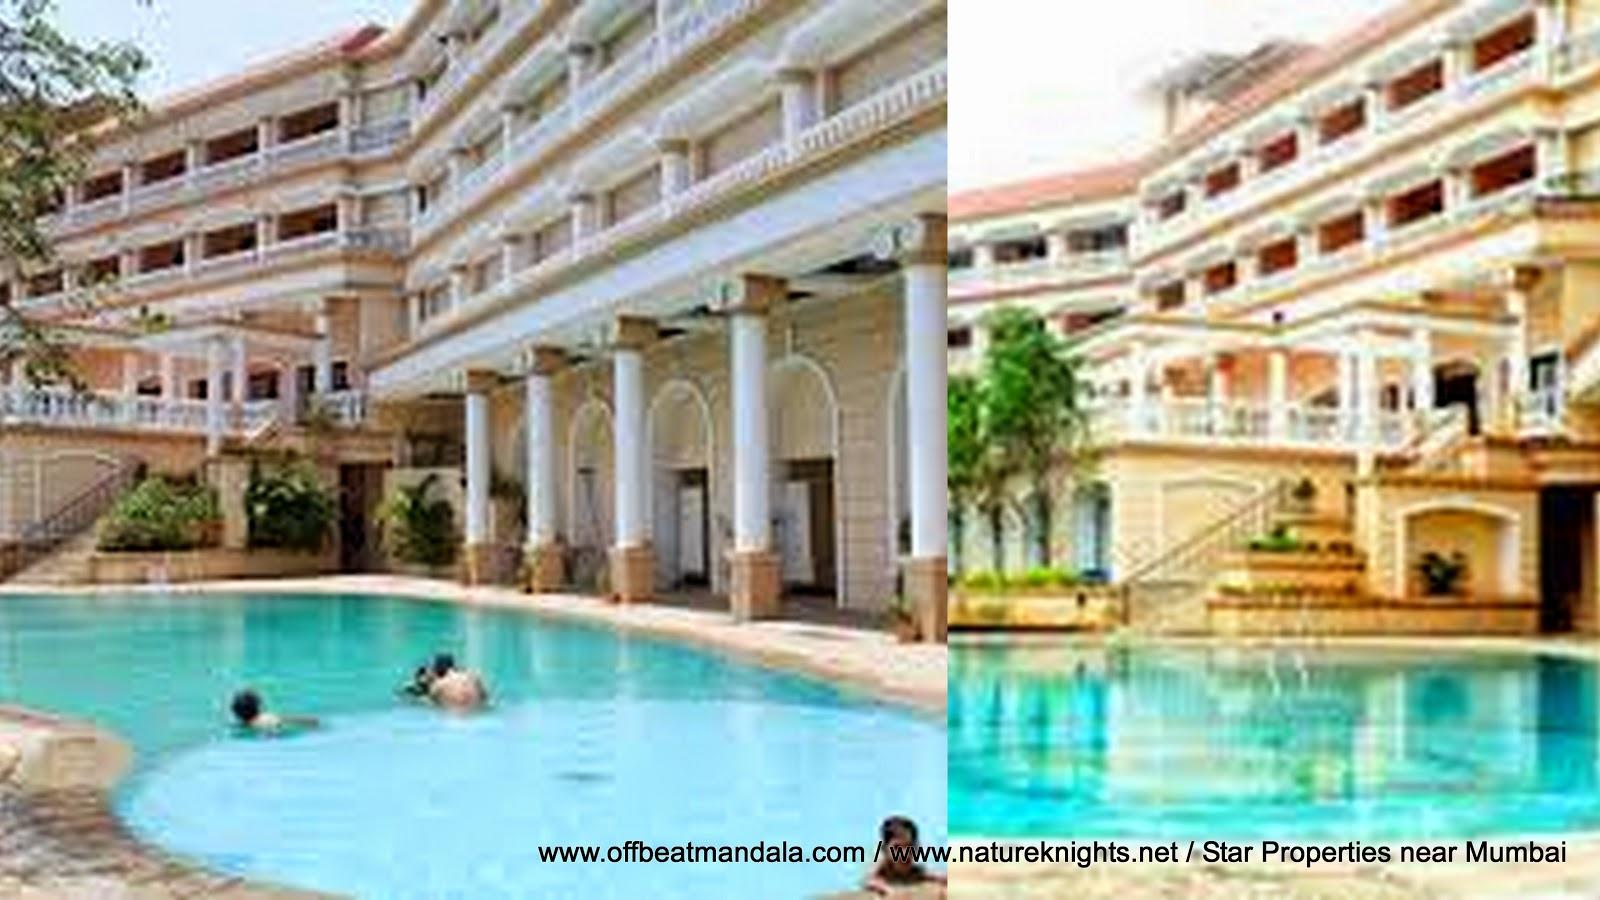 Off beat mandala resort lonavala 5 star - Hotel with private swimming pool in lonavala ...